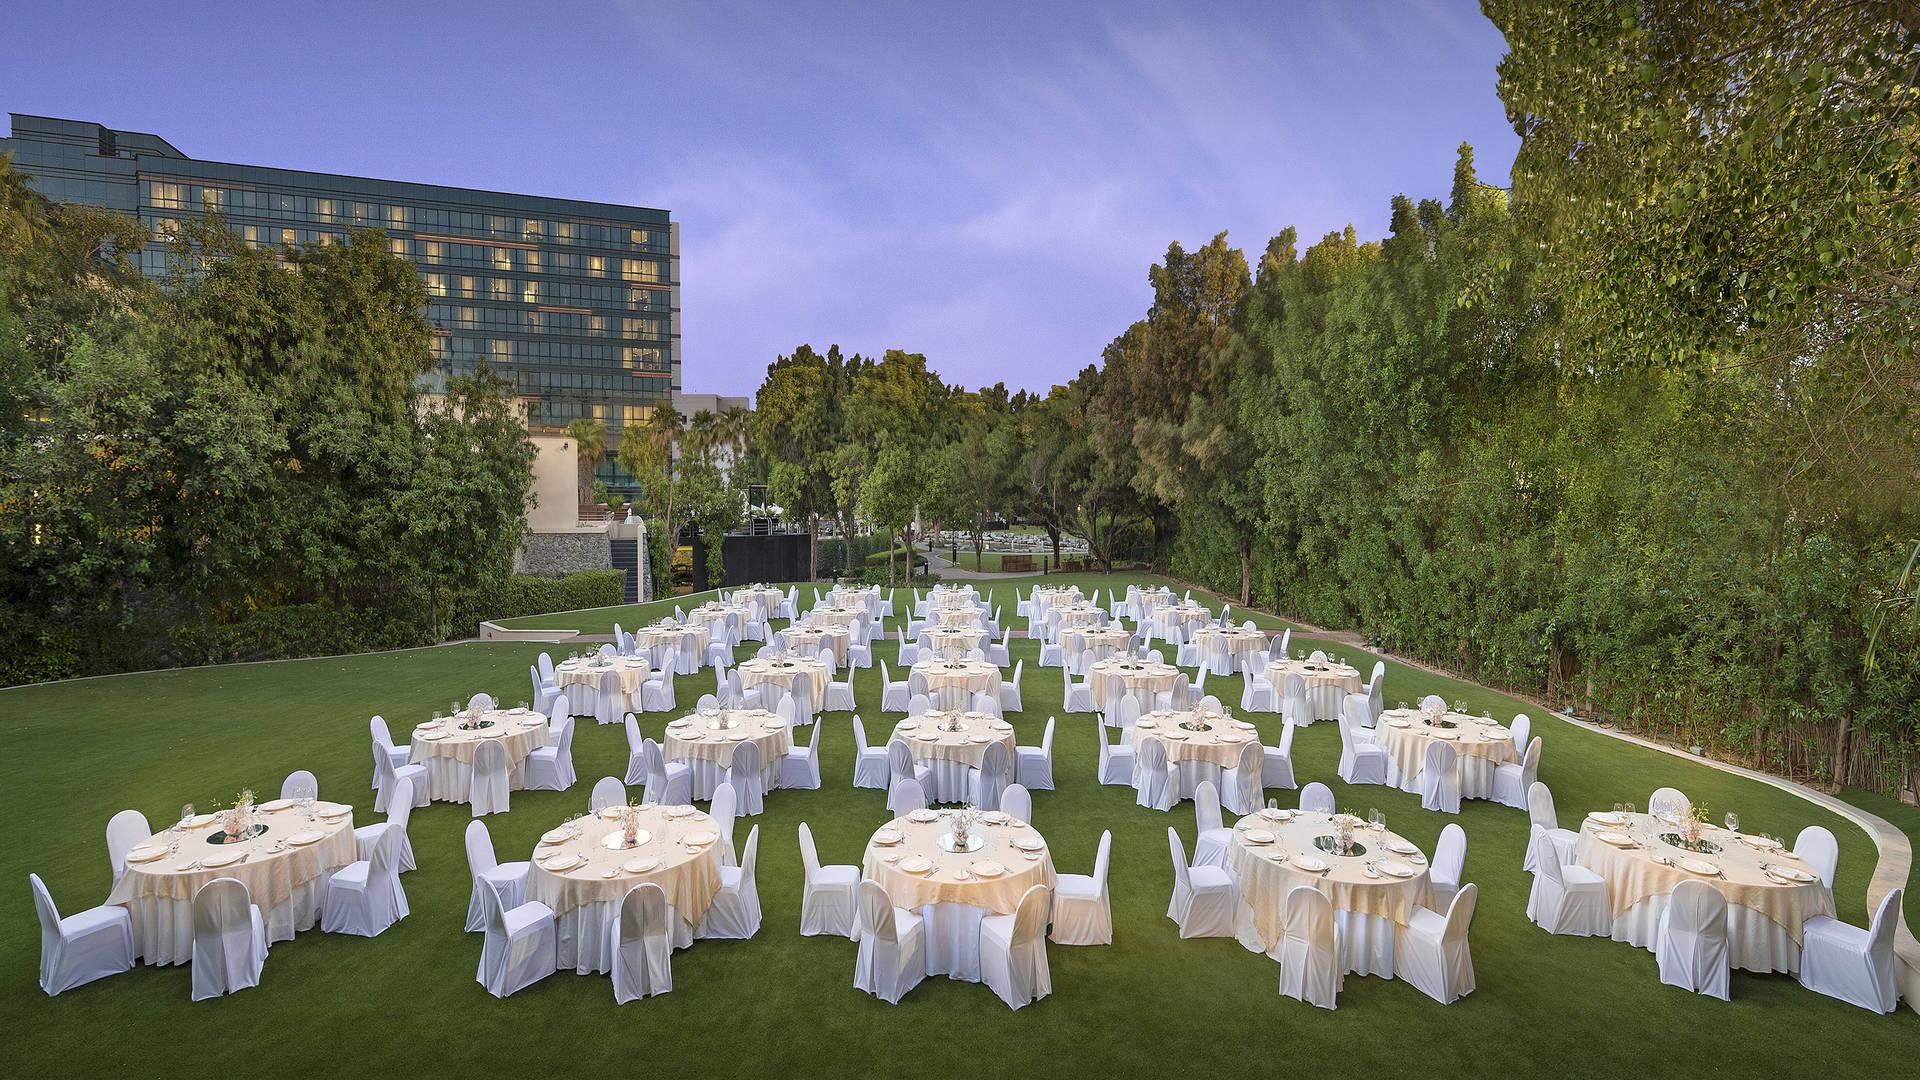 https://cdn.jumeirah.com/-/mediadh/DH/Hospitality/Jumeirah/Occasion/Dubai/Creekside-Hotel/Creekside-Hotel-Gardens/Jumeirah-Creekside-Hotel-Secret-Garden-Dinner-Set-Up-Evening16-9.jpg?h=1080&w=1920&hash=1A1D35D97AB23CE6BCA87280C149877F